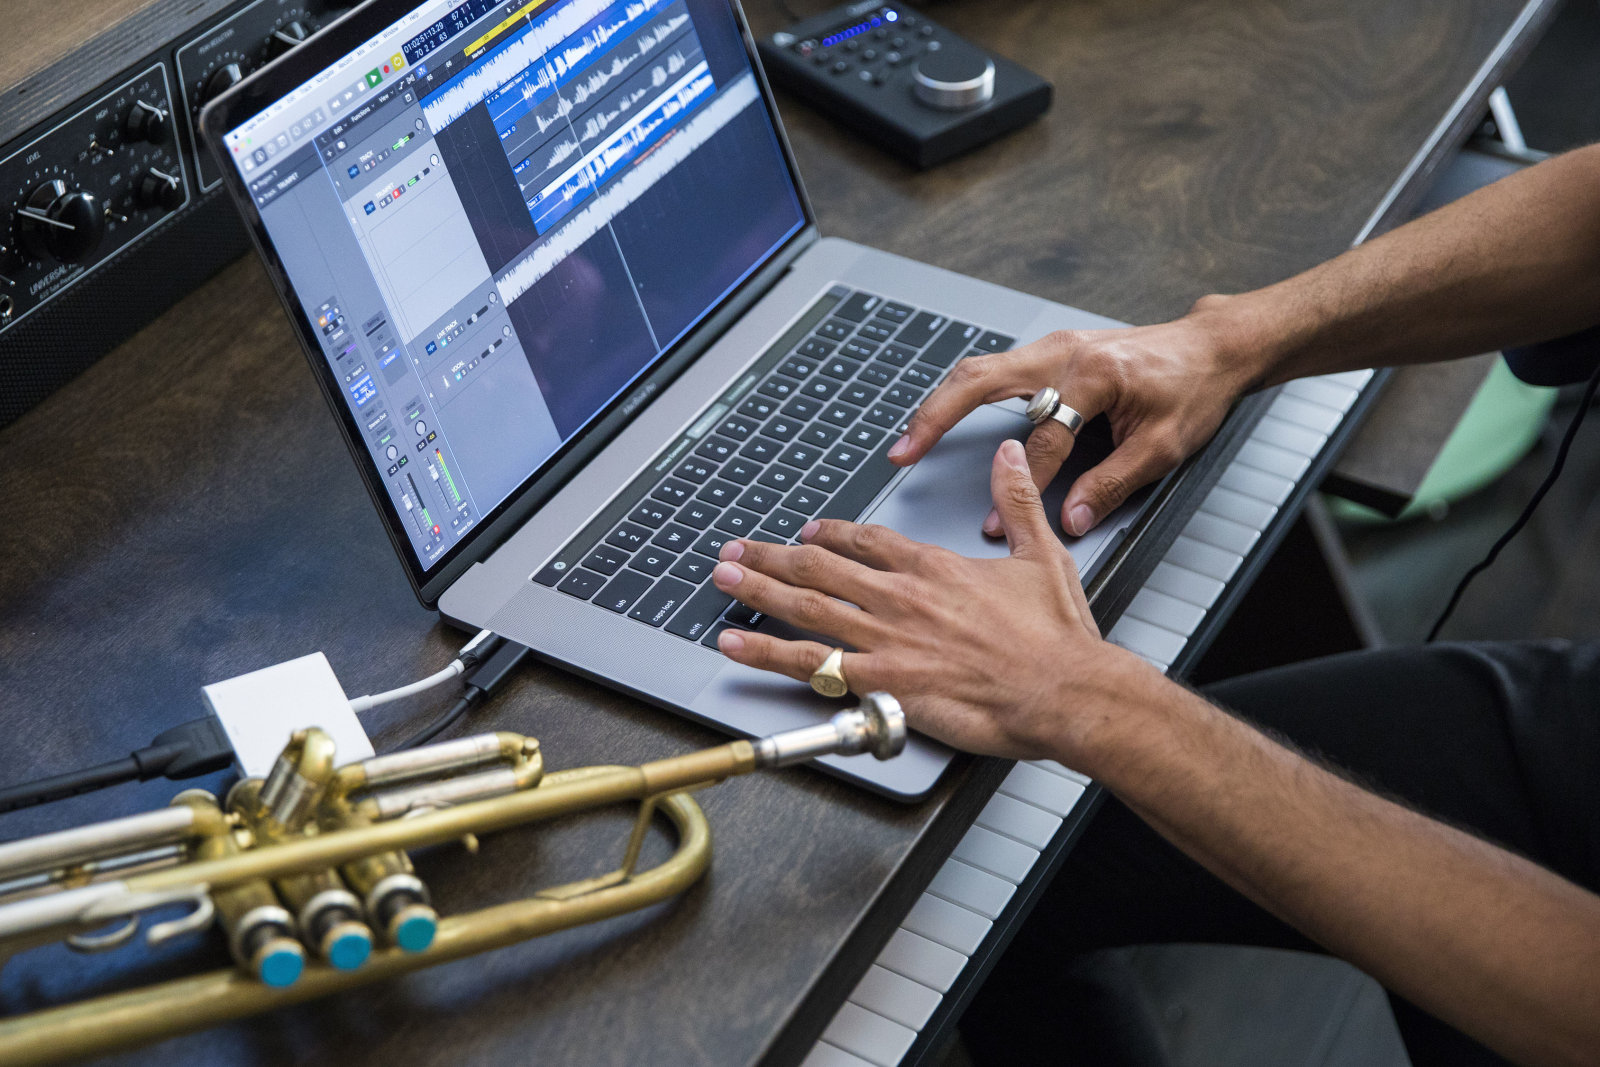 Macbook Pro 新版悄然登场,帝王版价格超过45000元